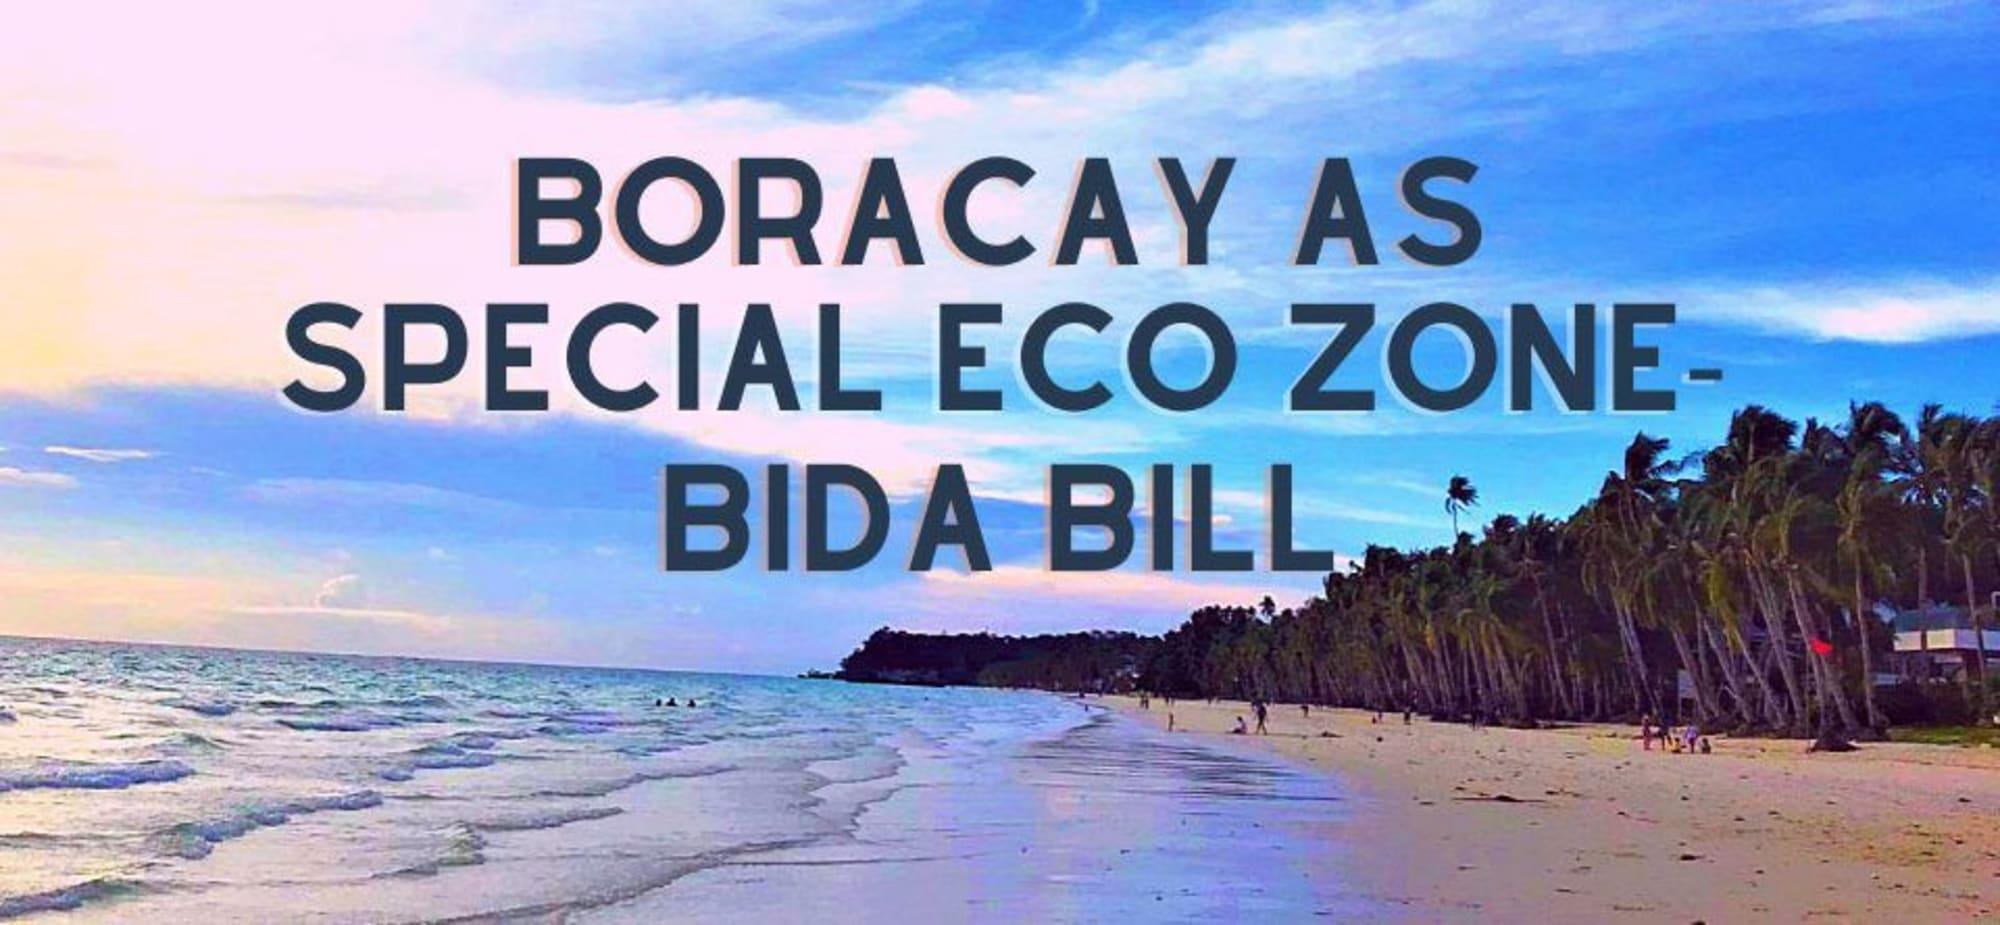 BIDA Bill to 'level up' Boracay as special ECOZONE